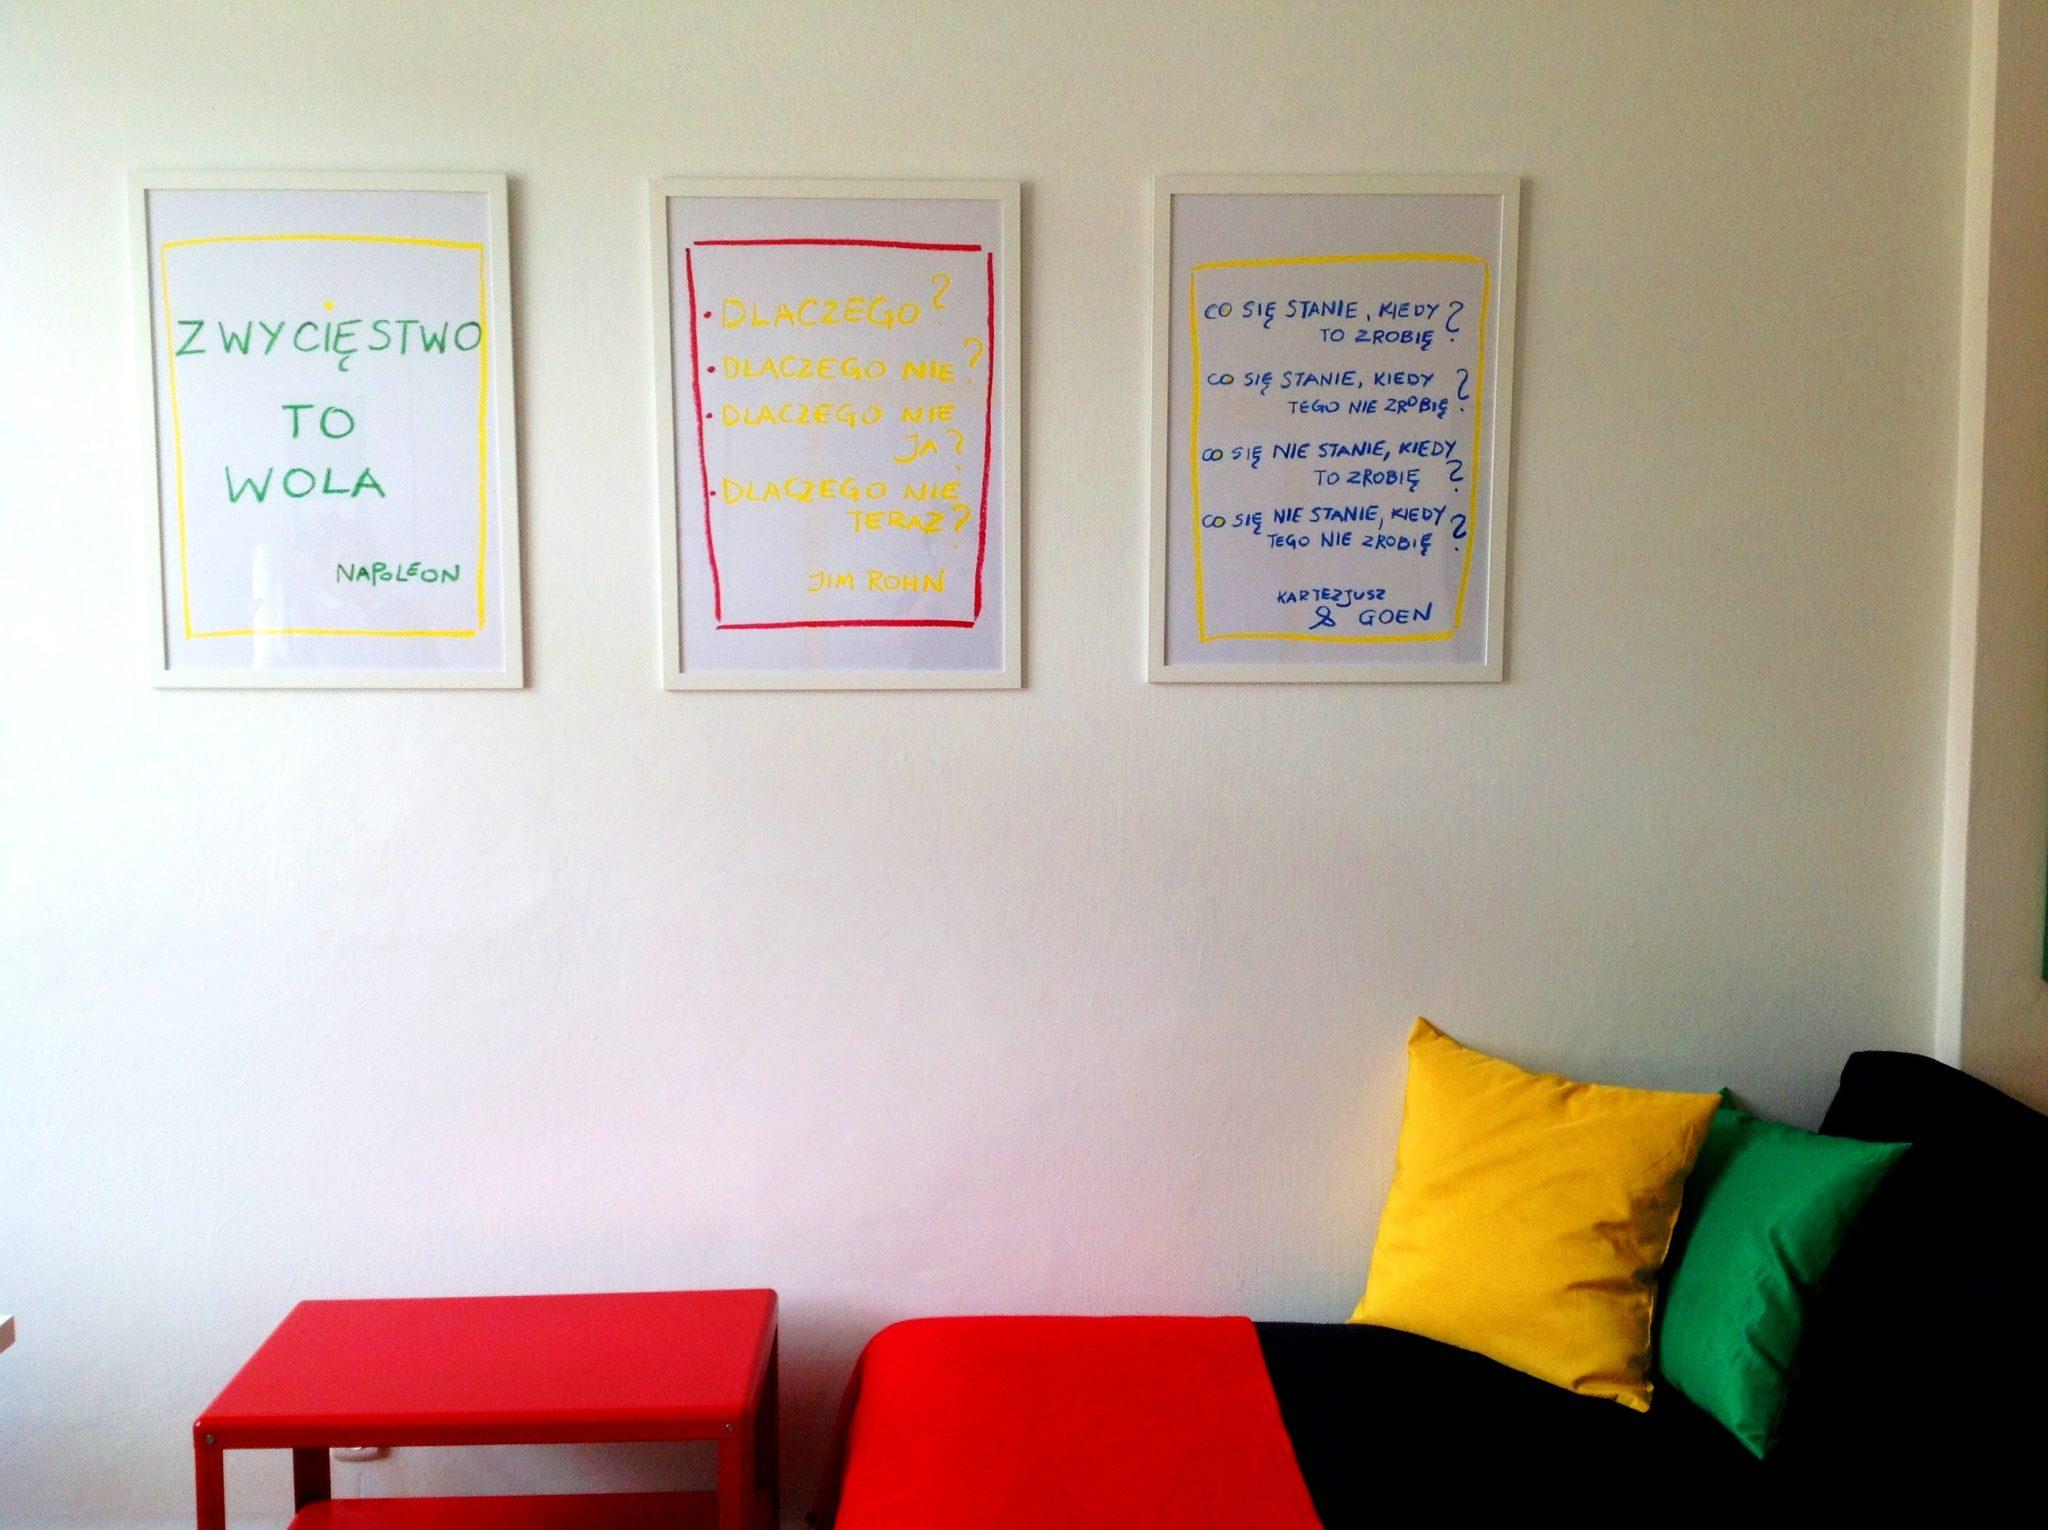 13 projekt wnetrza male kolorowe biuro interior design small colorful office google style forelementspl